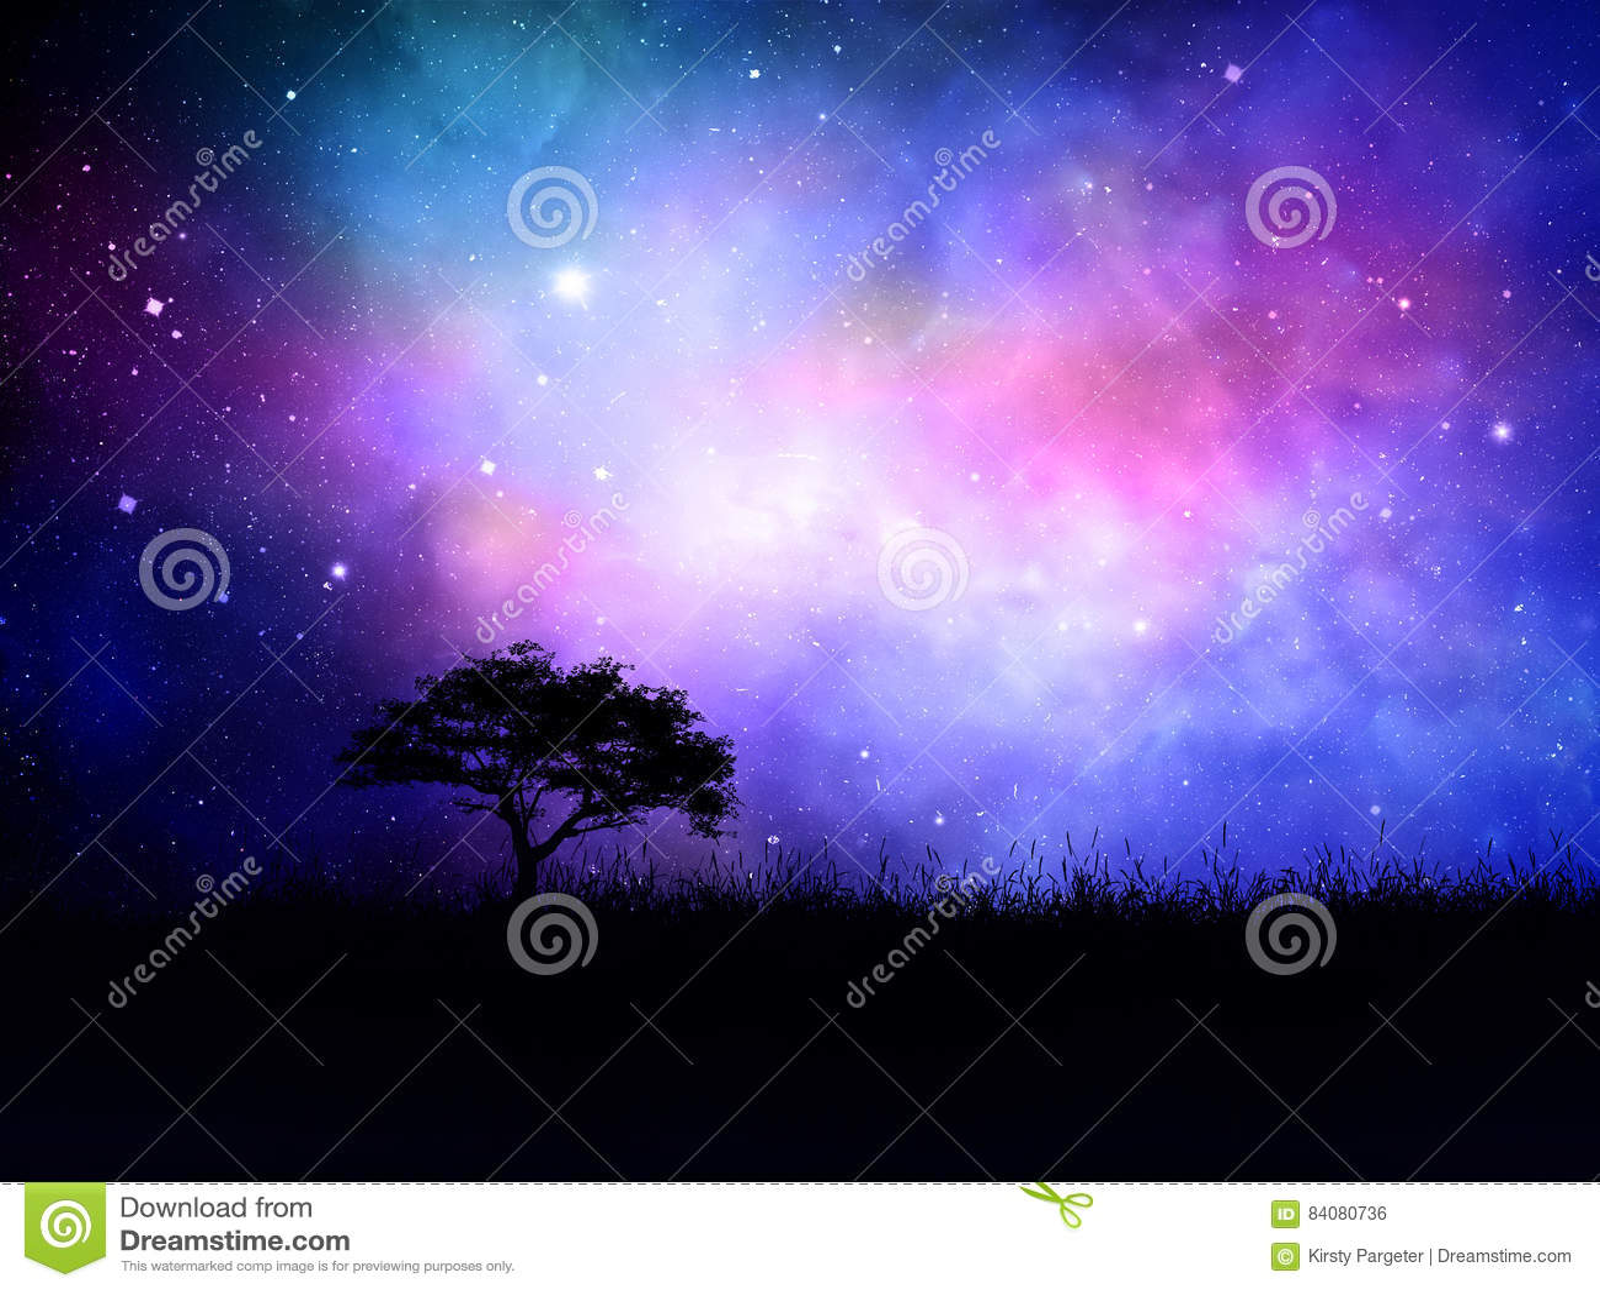 nebula render - photo #12